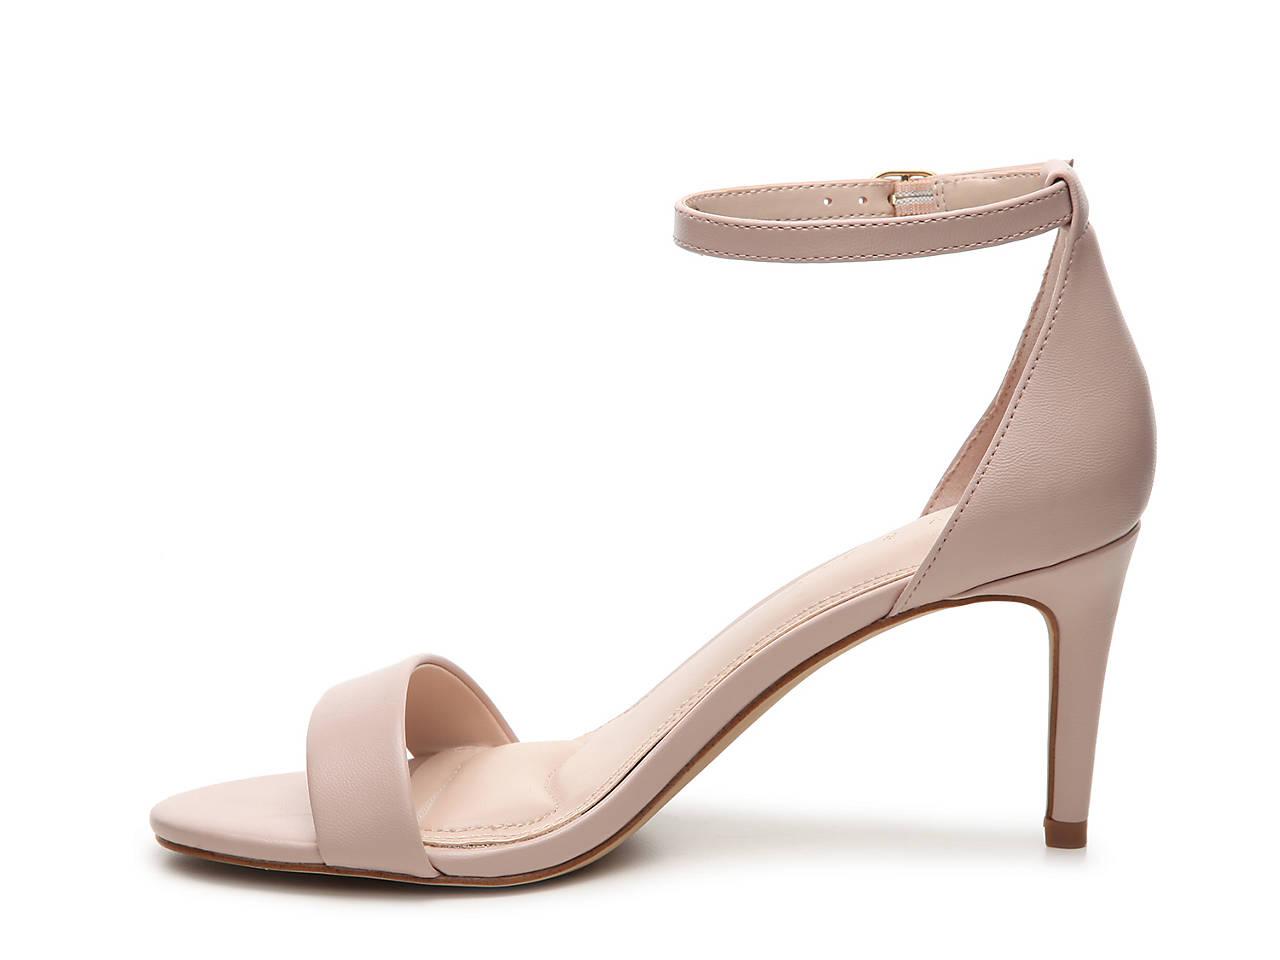 486595ce3a17 Home · Women s Shoes · Sandals  Kirstie Sandal. previous